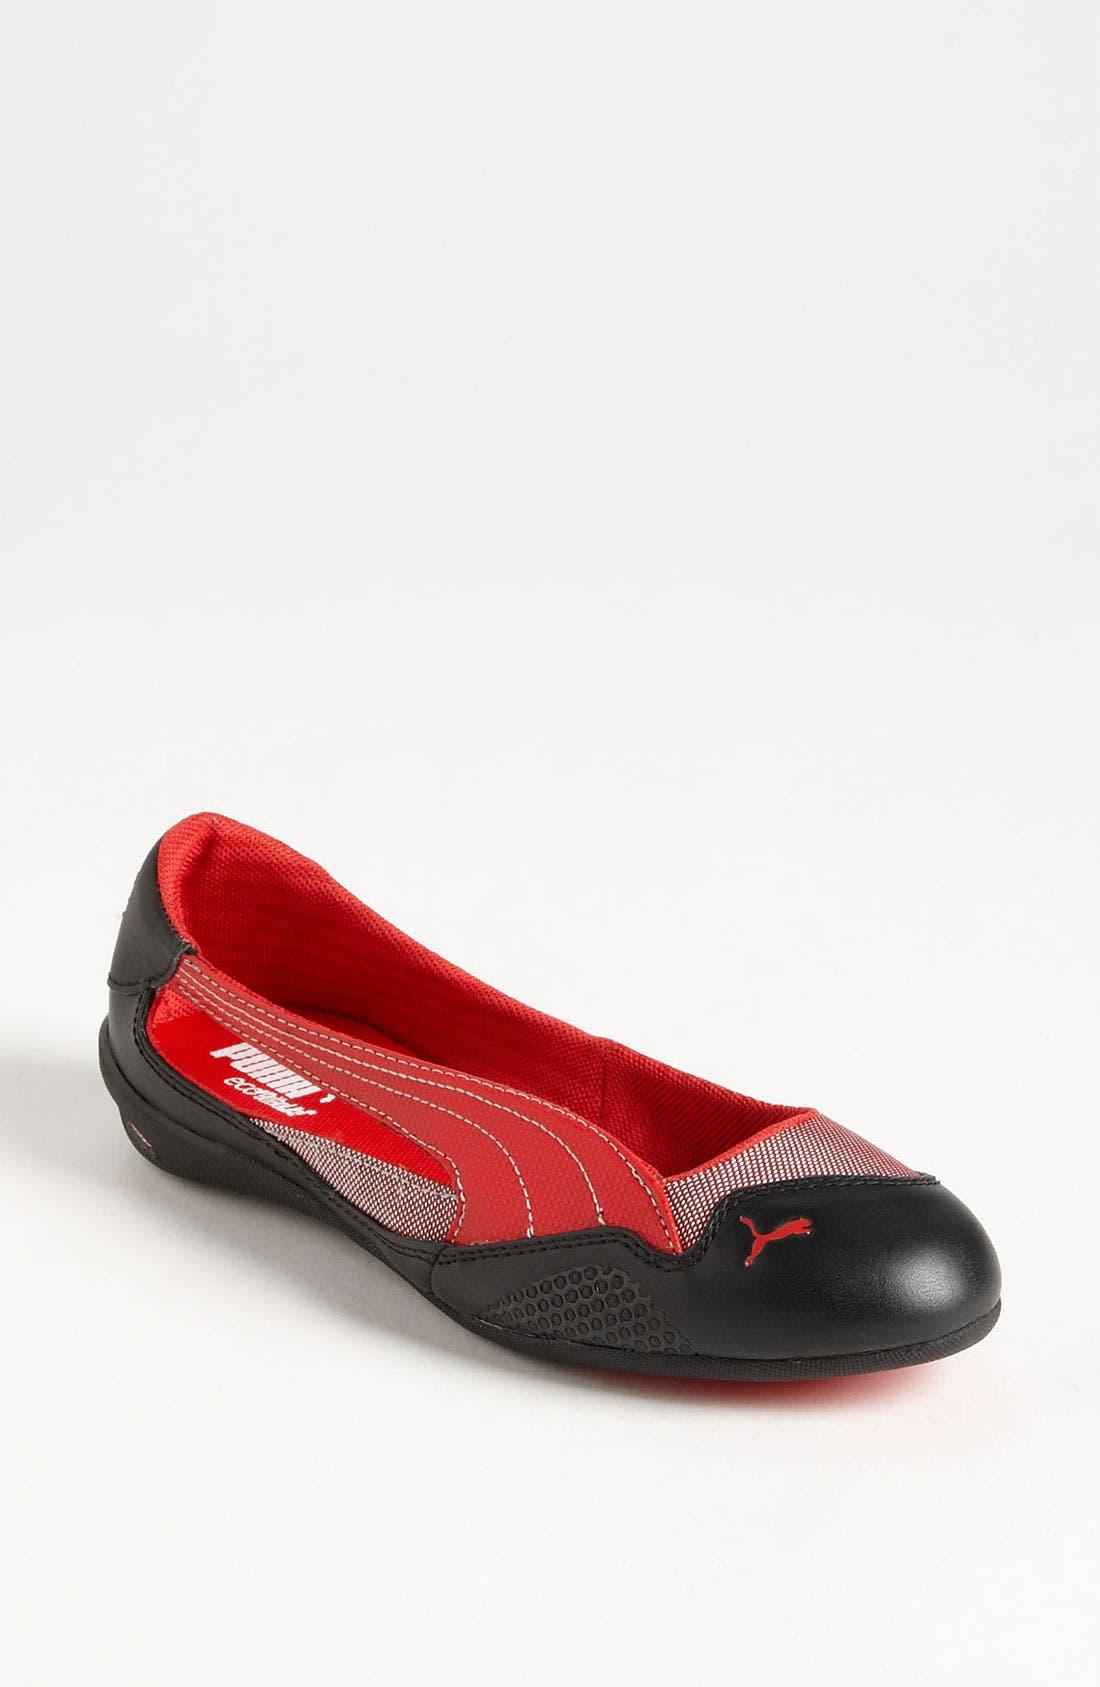 Main Image - PUMA 'Diva' Ballerina Sneaker